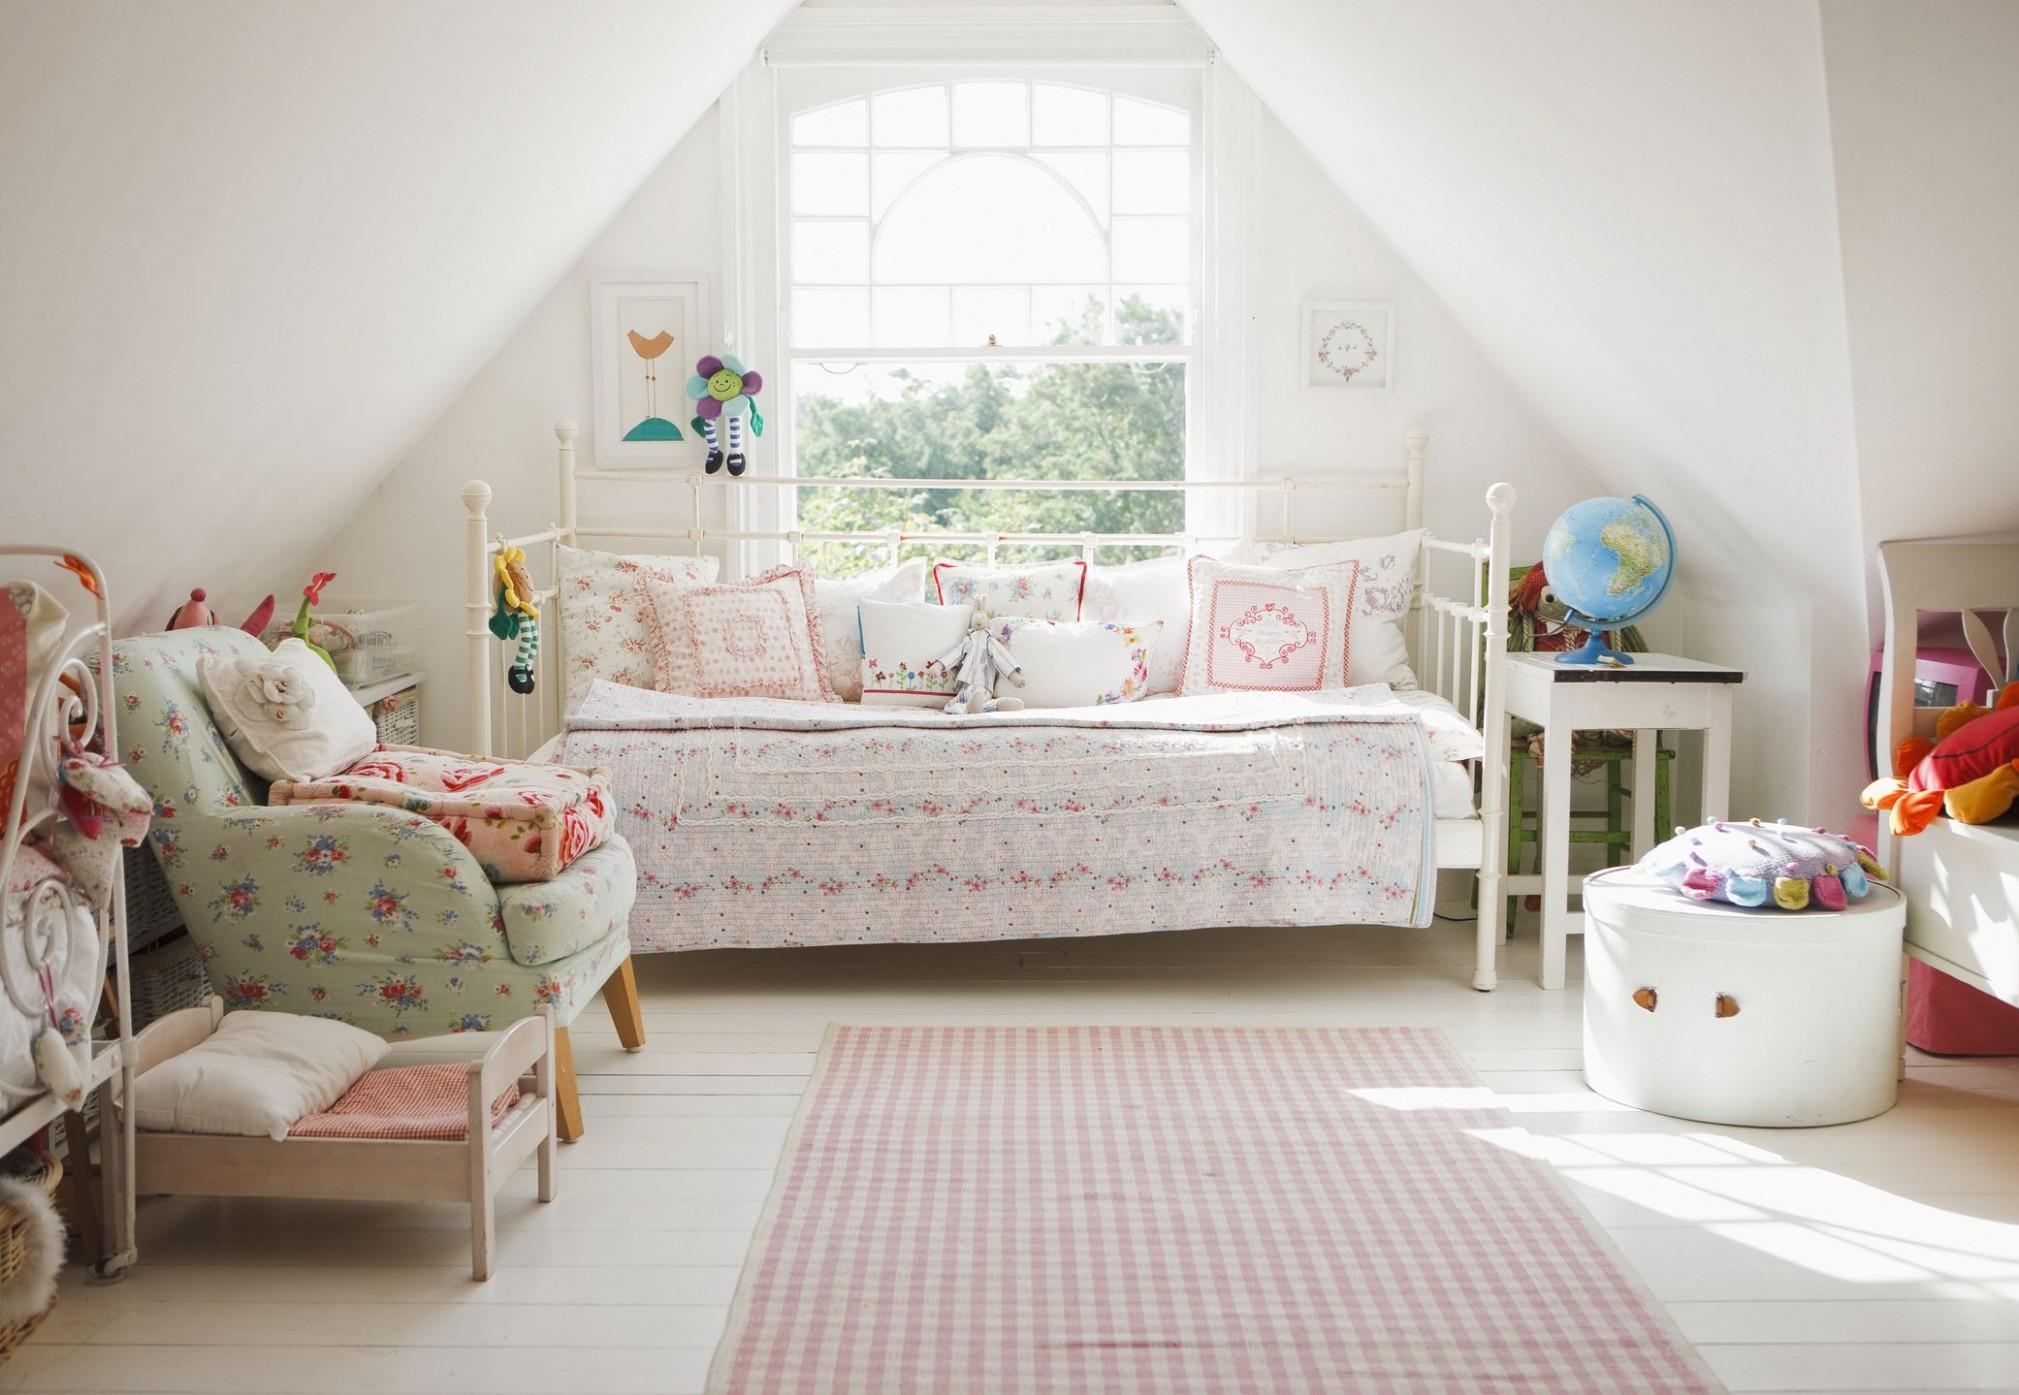 10 Best Baby Room Ideas - Nursery Design, Organization, and  - Baby Room Photos